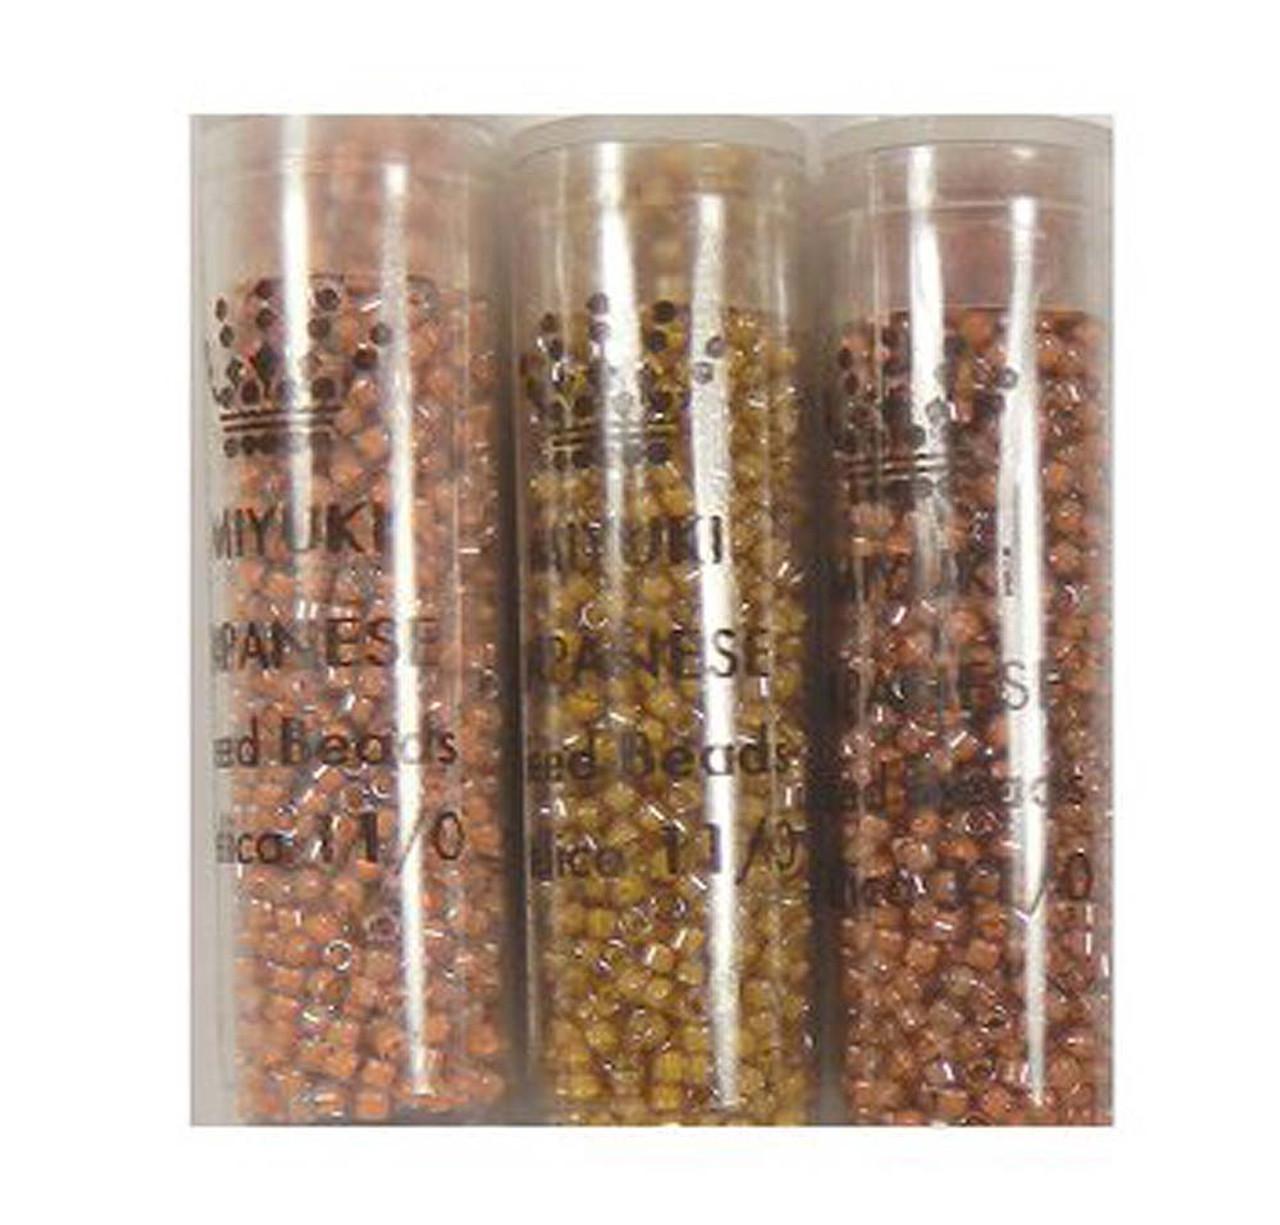 buy online edbcd 7f0c8 3S Luminous Sampler (Db2044-Guava)(Db2043-Almond)(Db2042-Sea Coral) Deli  Db2044-2043-2042